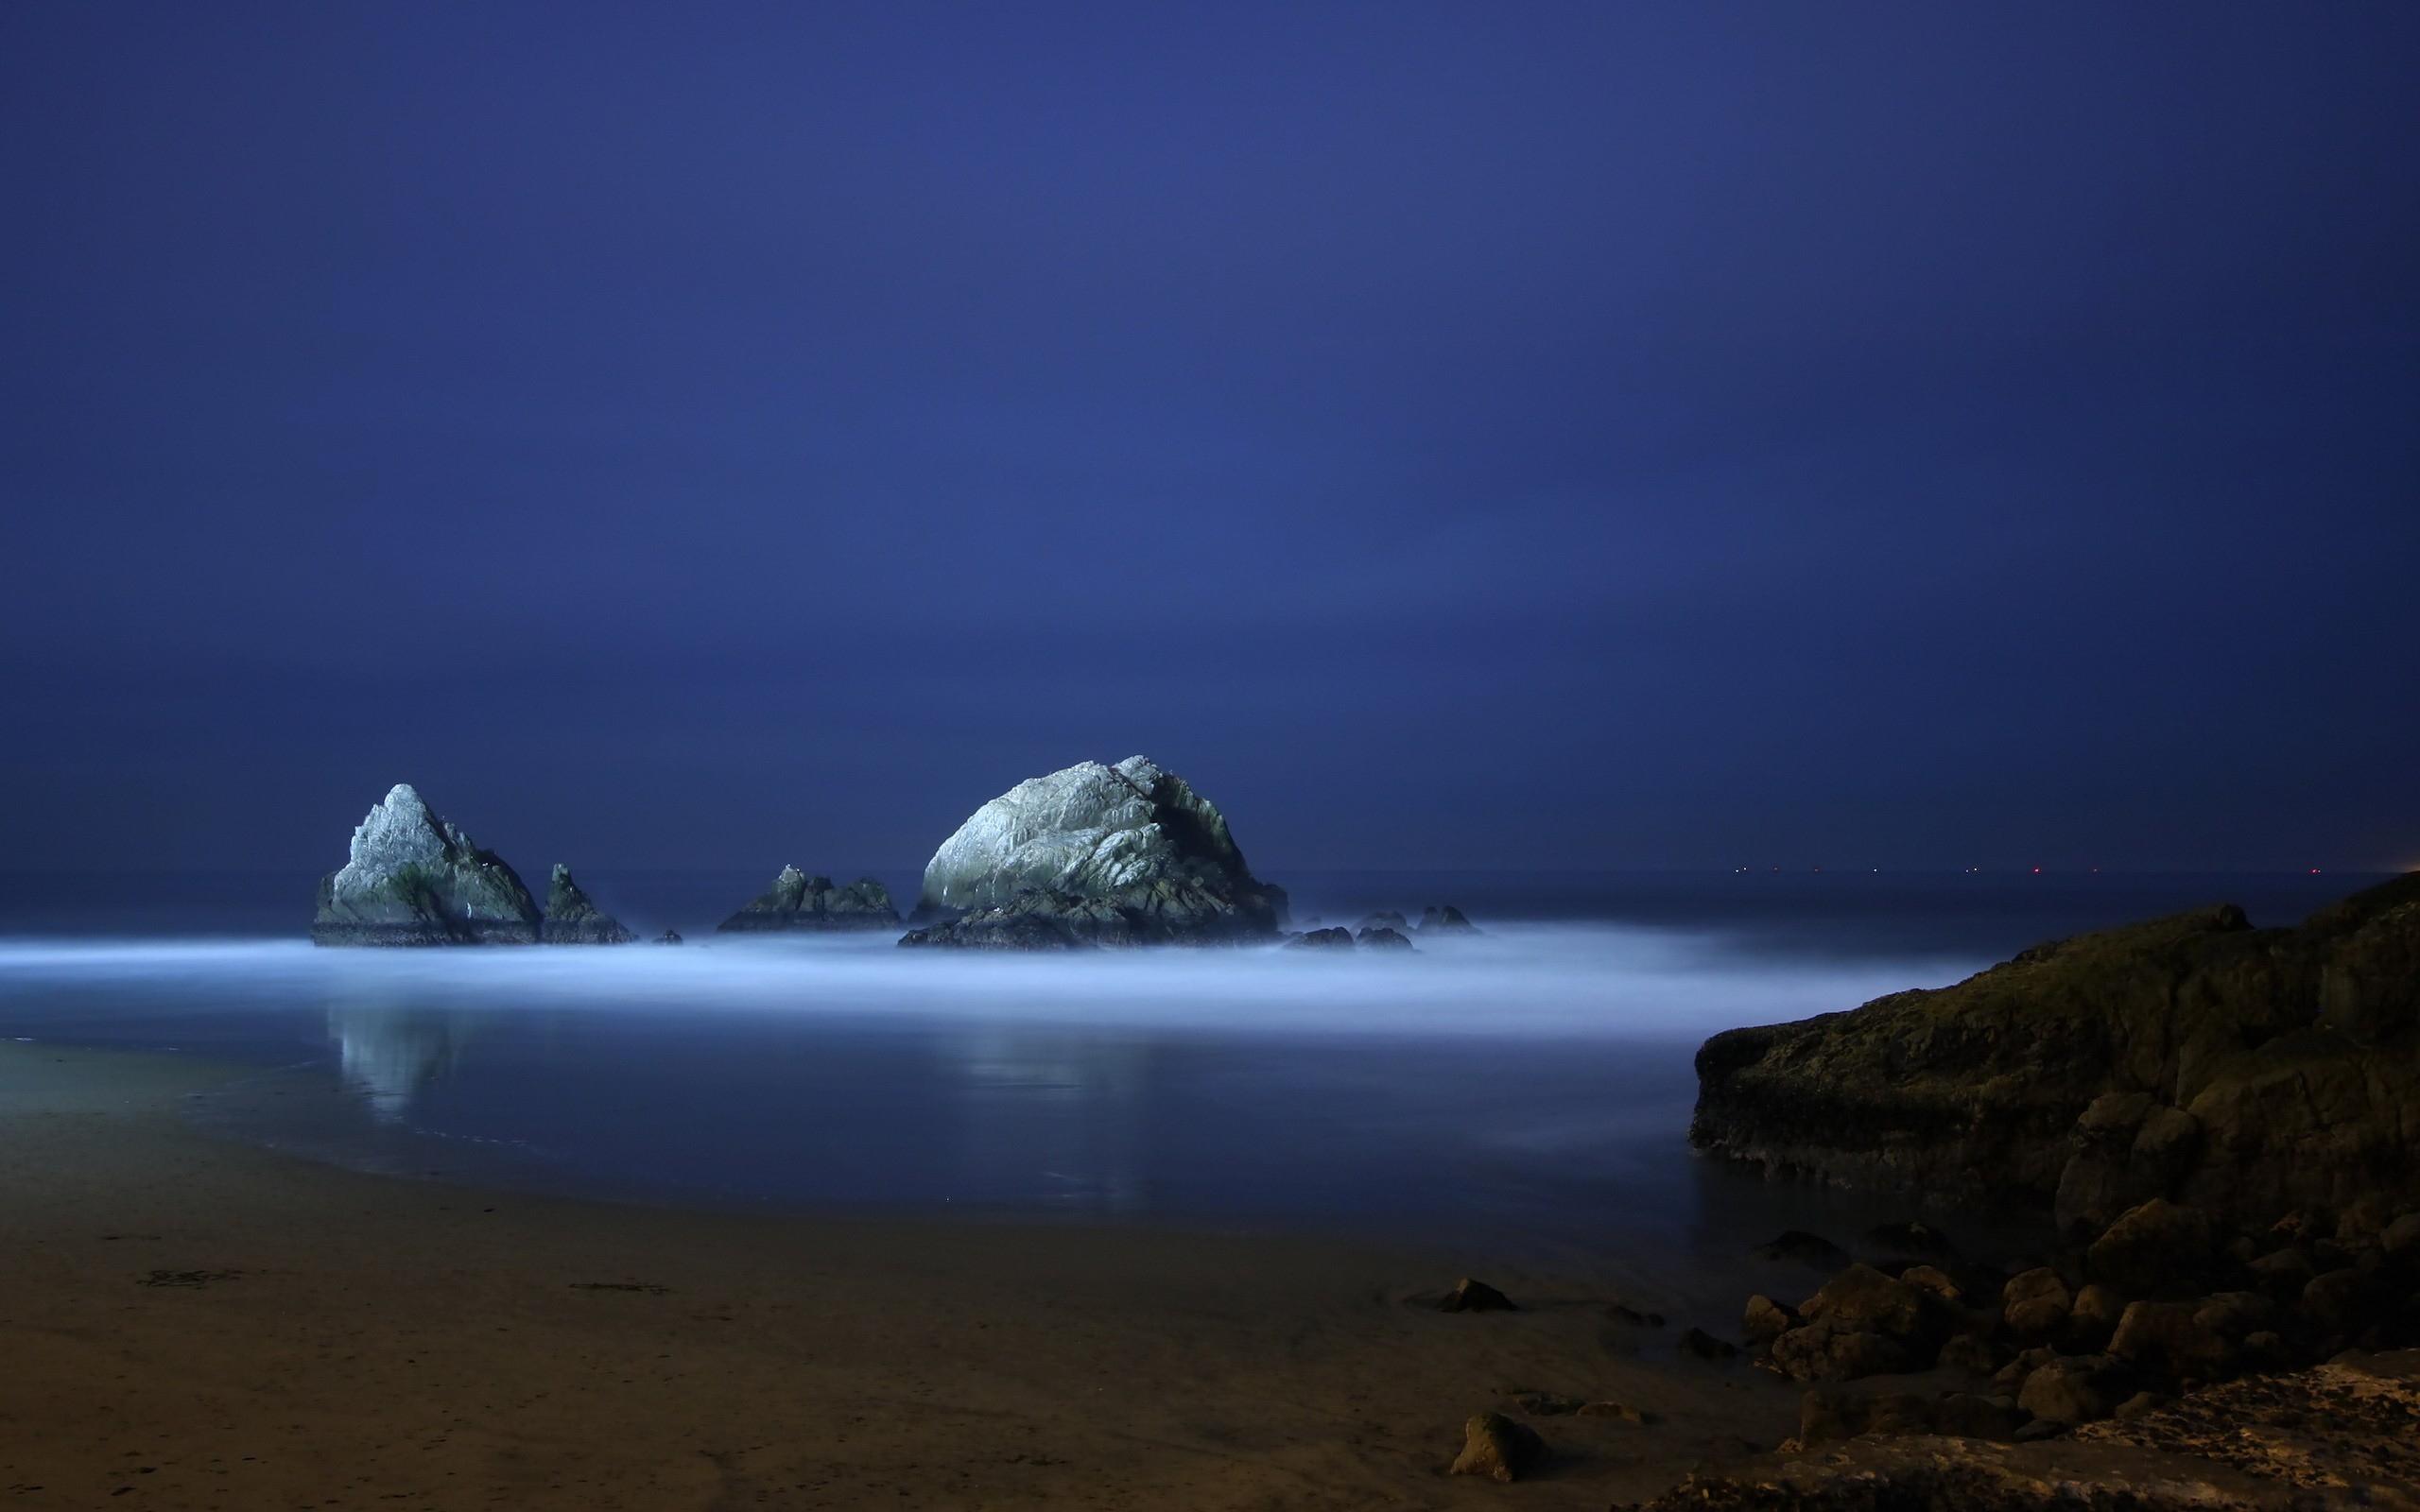 Картинка ночной берег моря